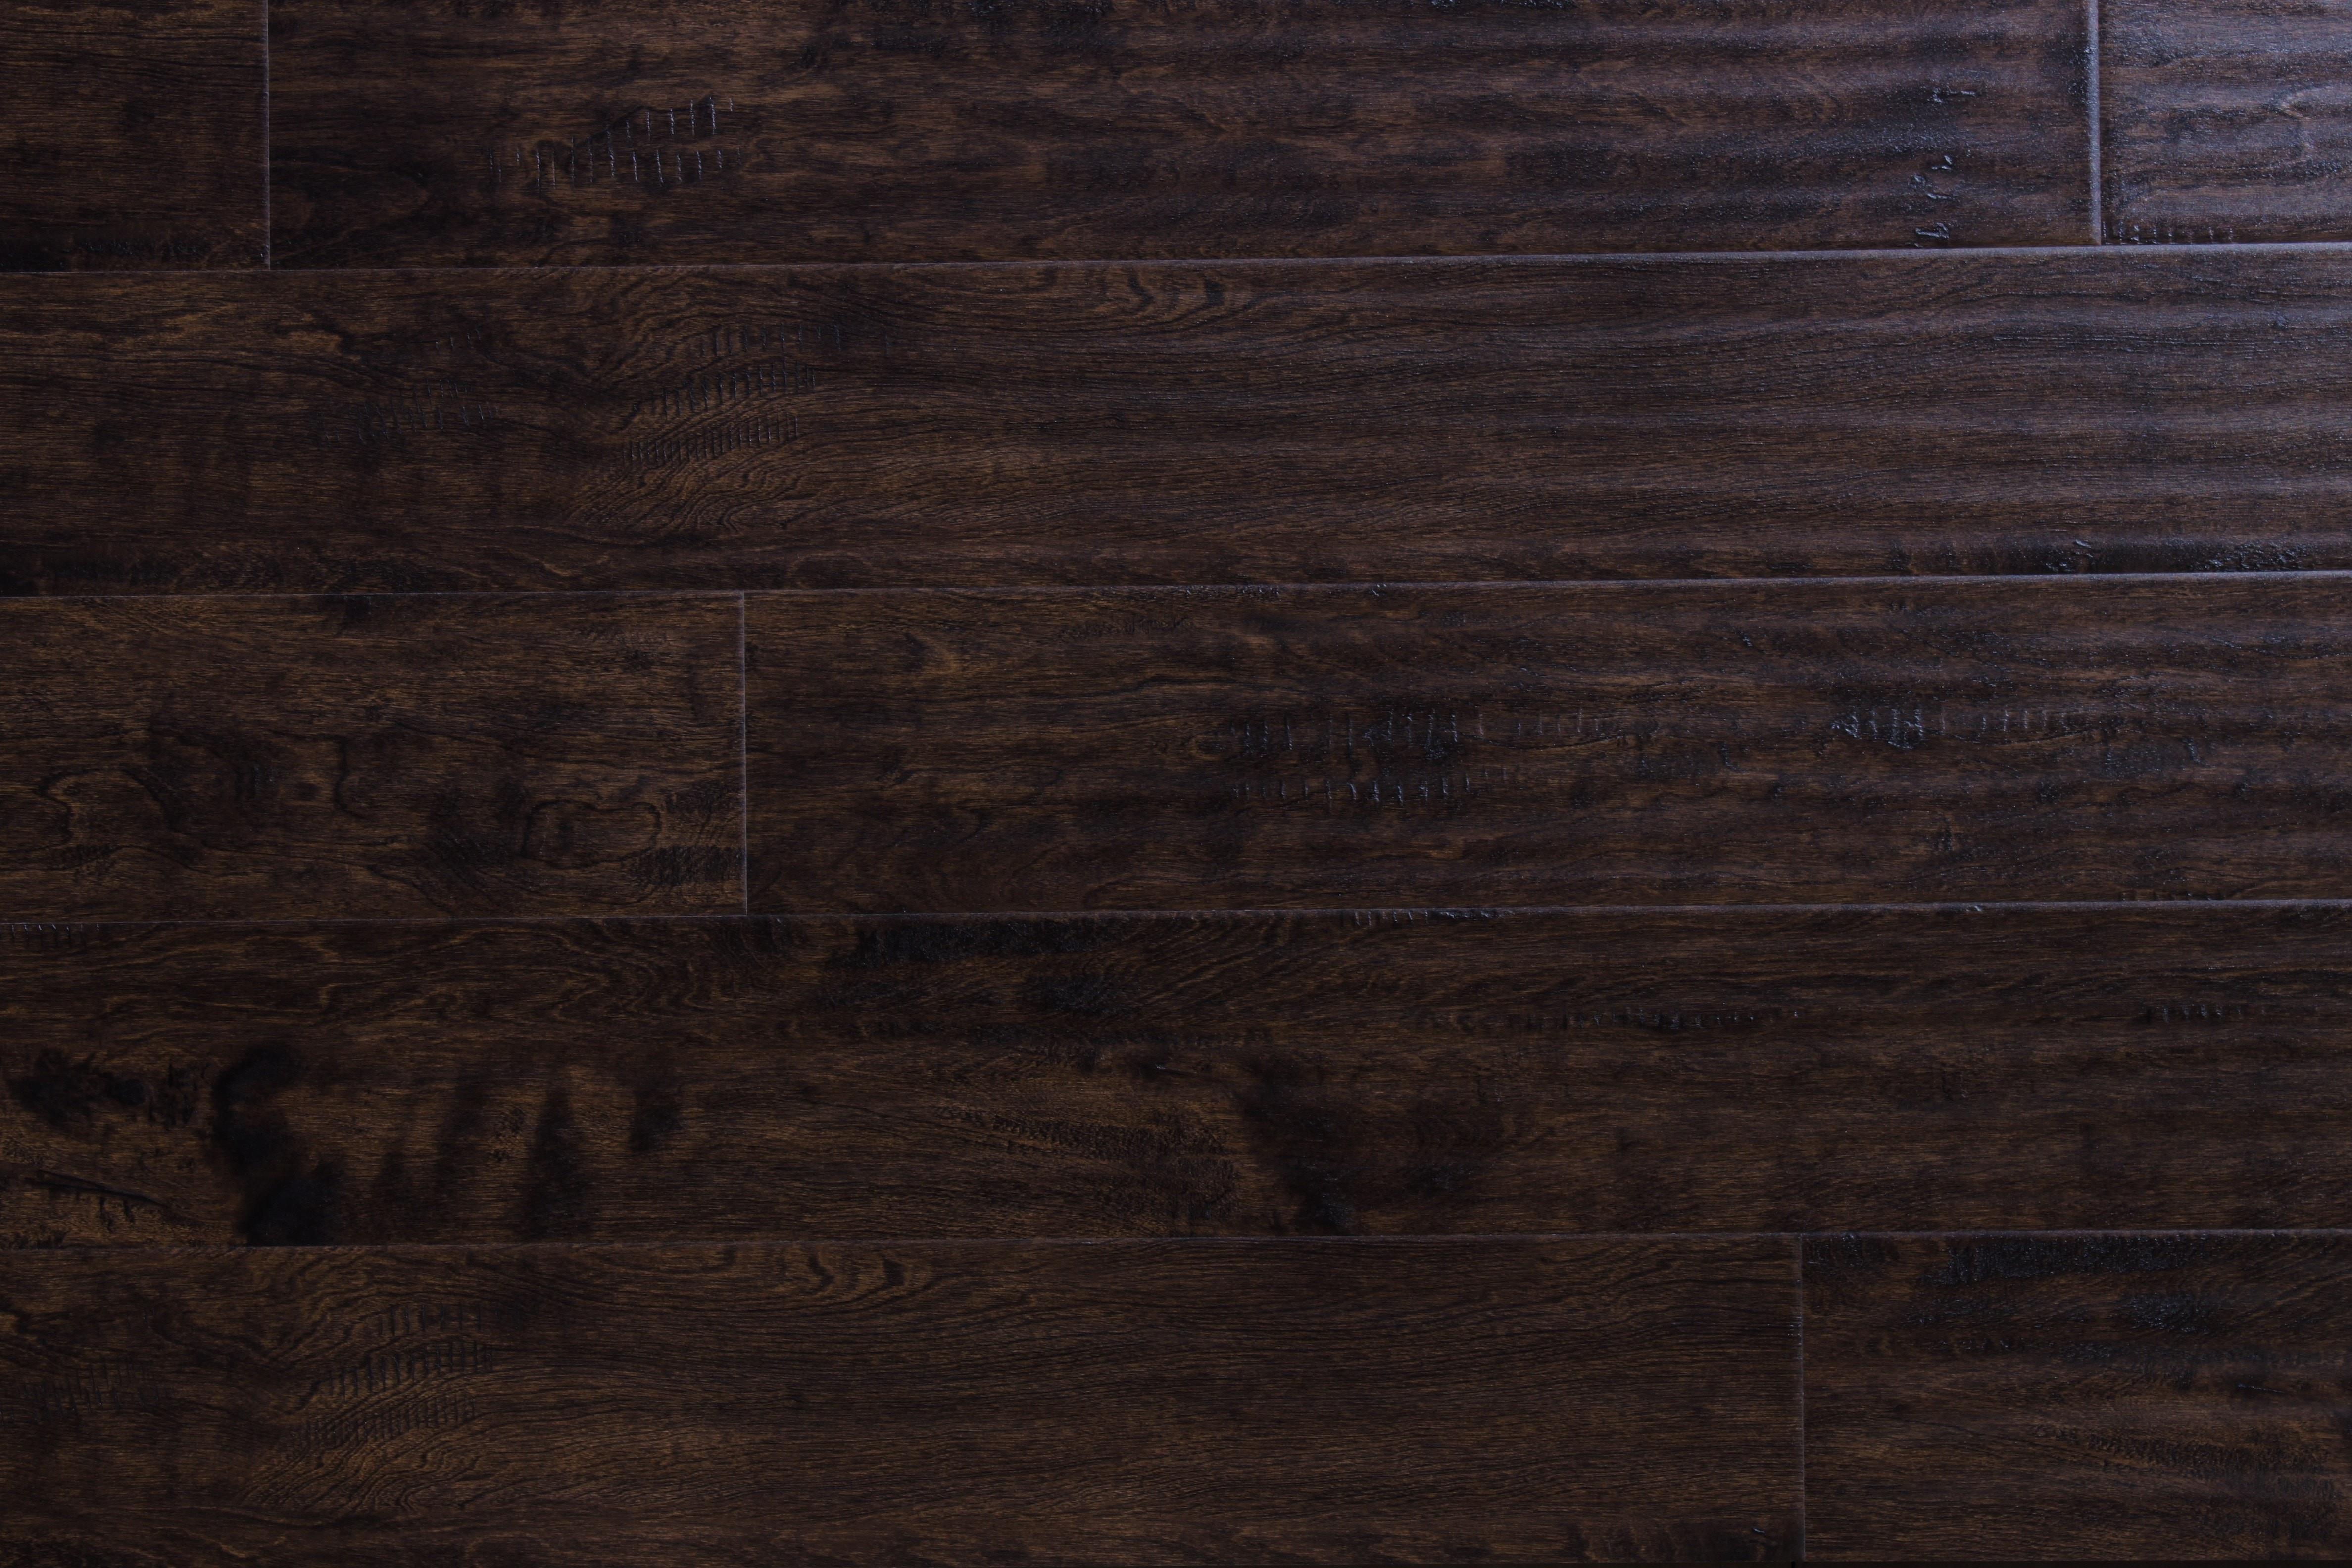 15 Stylish Bruce Engineered Hardwood Floors 2021 free download bruce engineered hardwood floors of wood flooring free samples available at builddirecta with regard to tailor multi gb 5874277bb8d3c